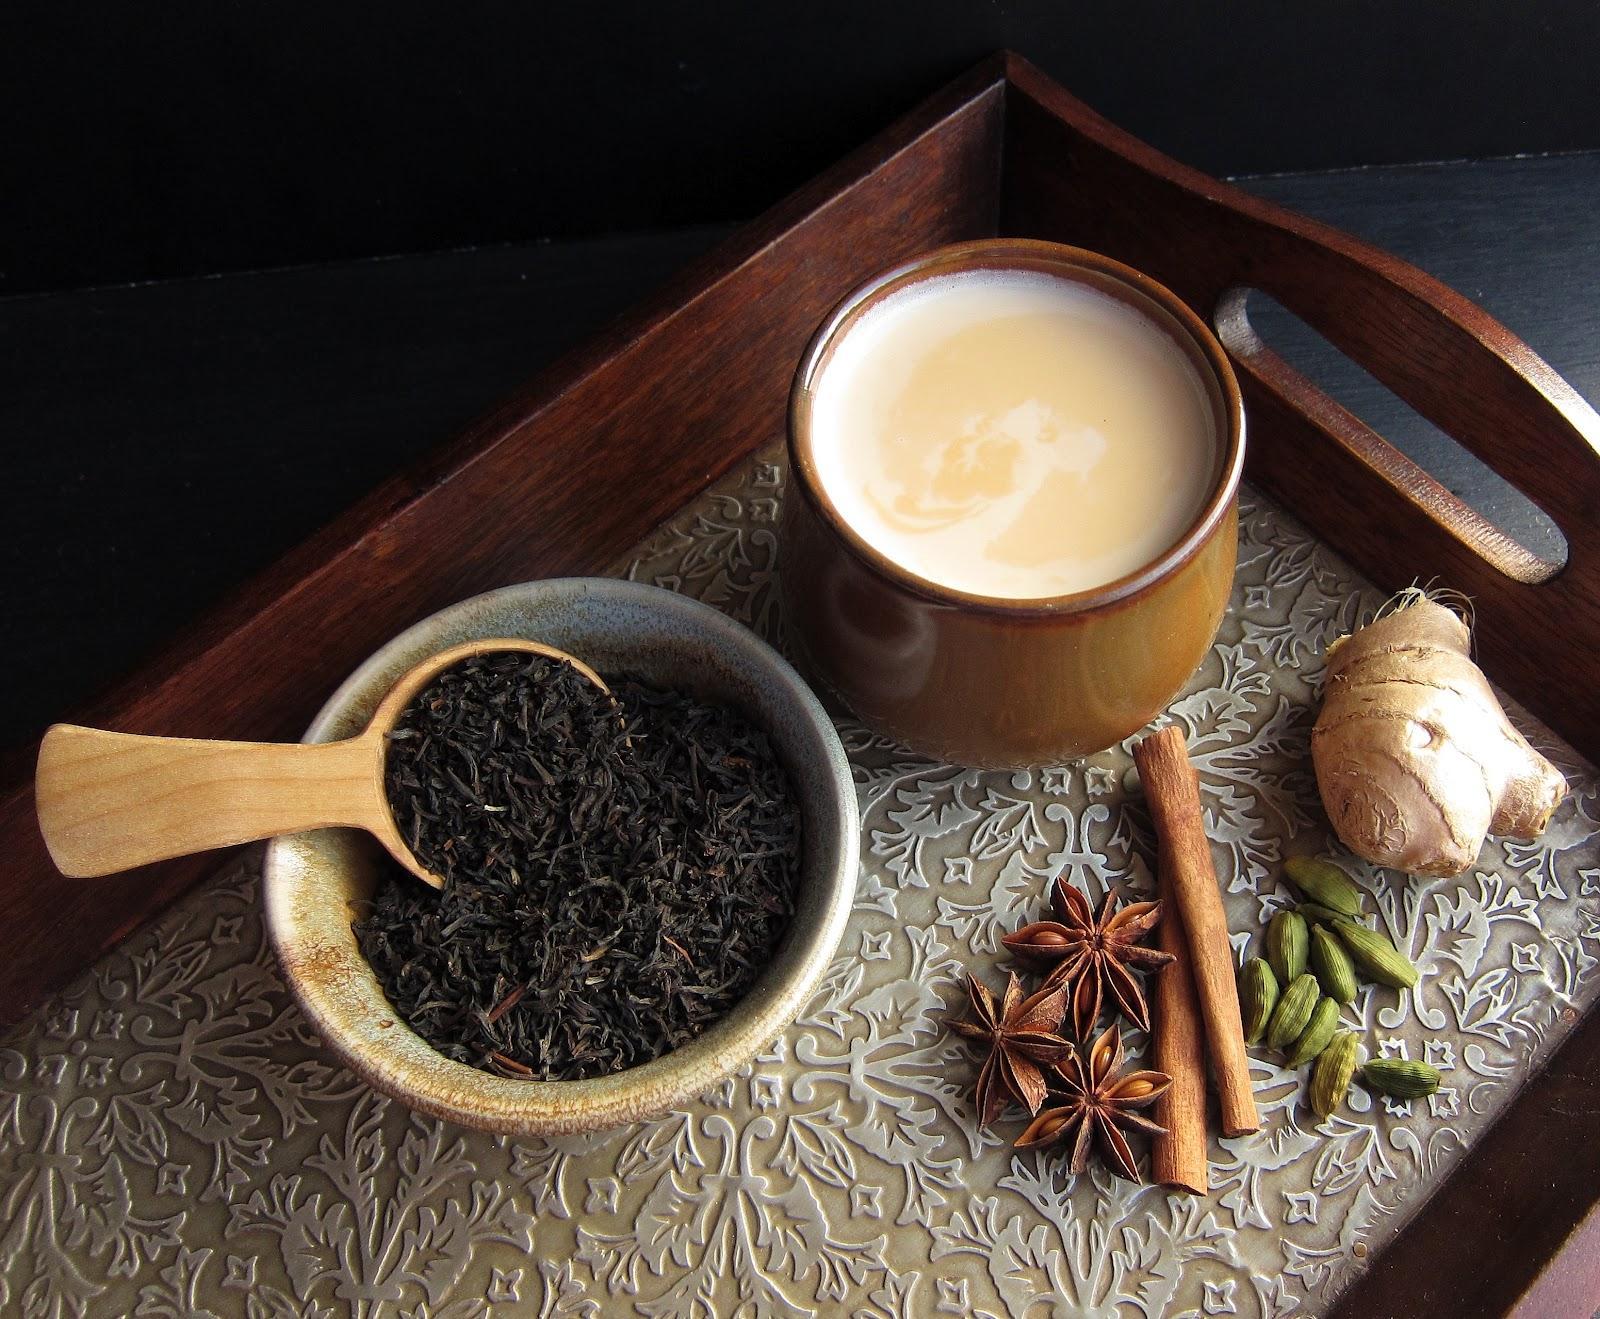 Чай масала: лучшая альтернатива традиционному завтраку